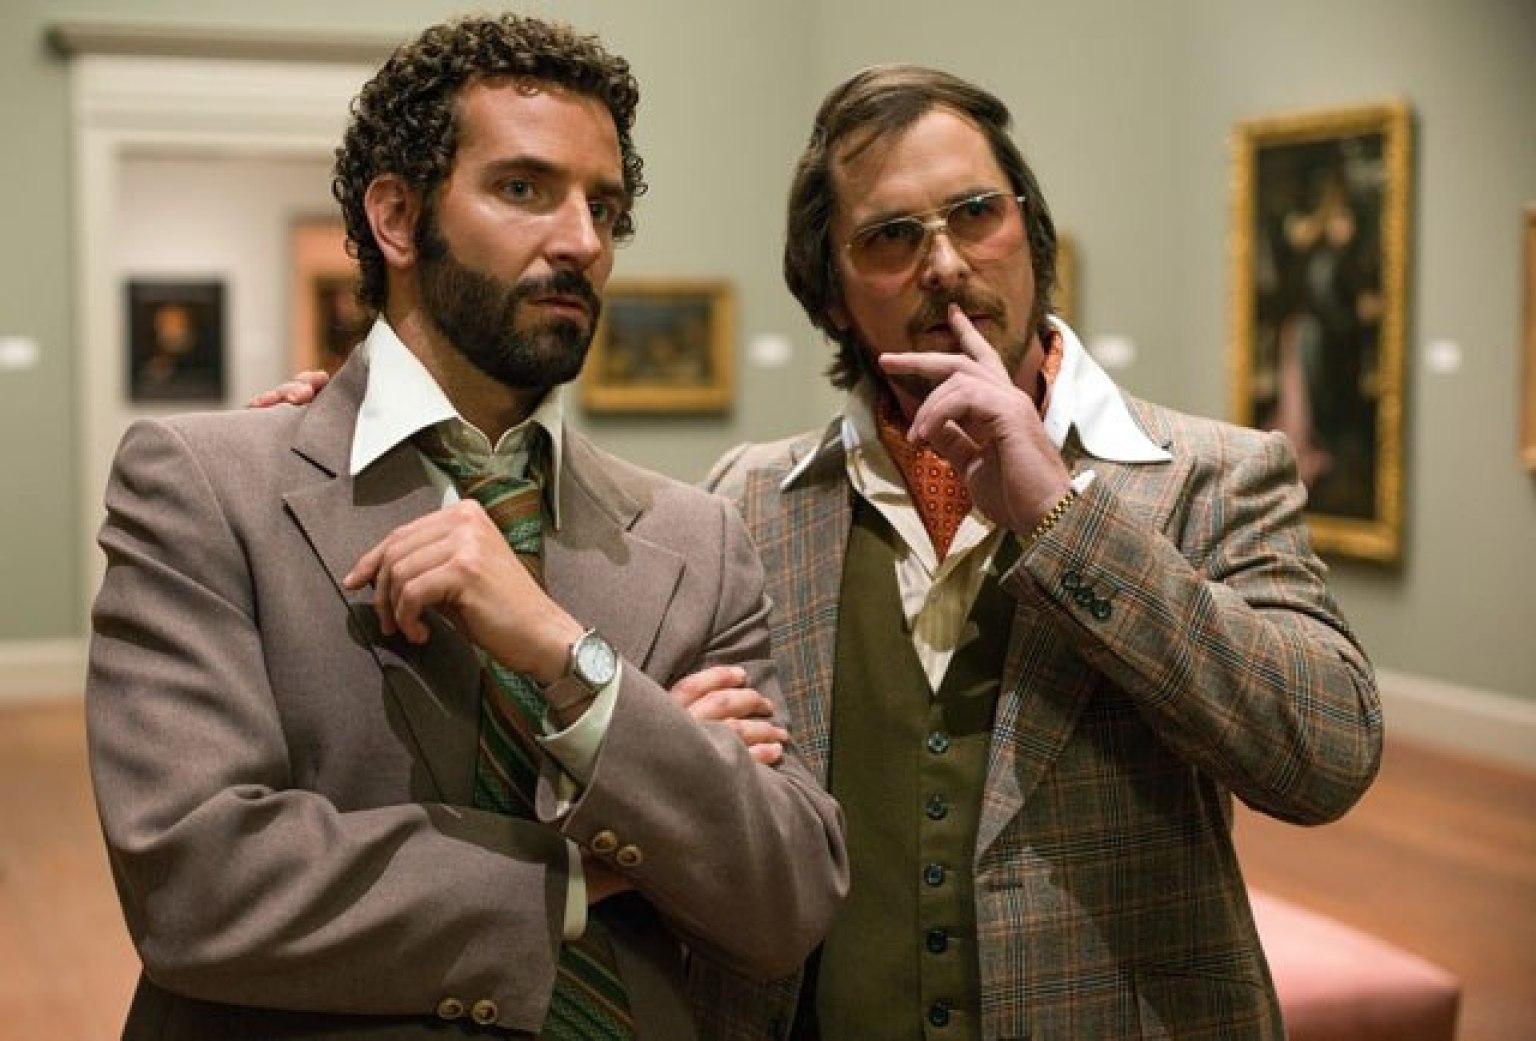 Christian Bale and Bradley Cooper in American Hustle.